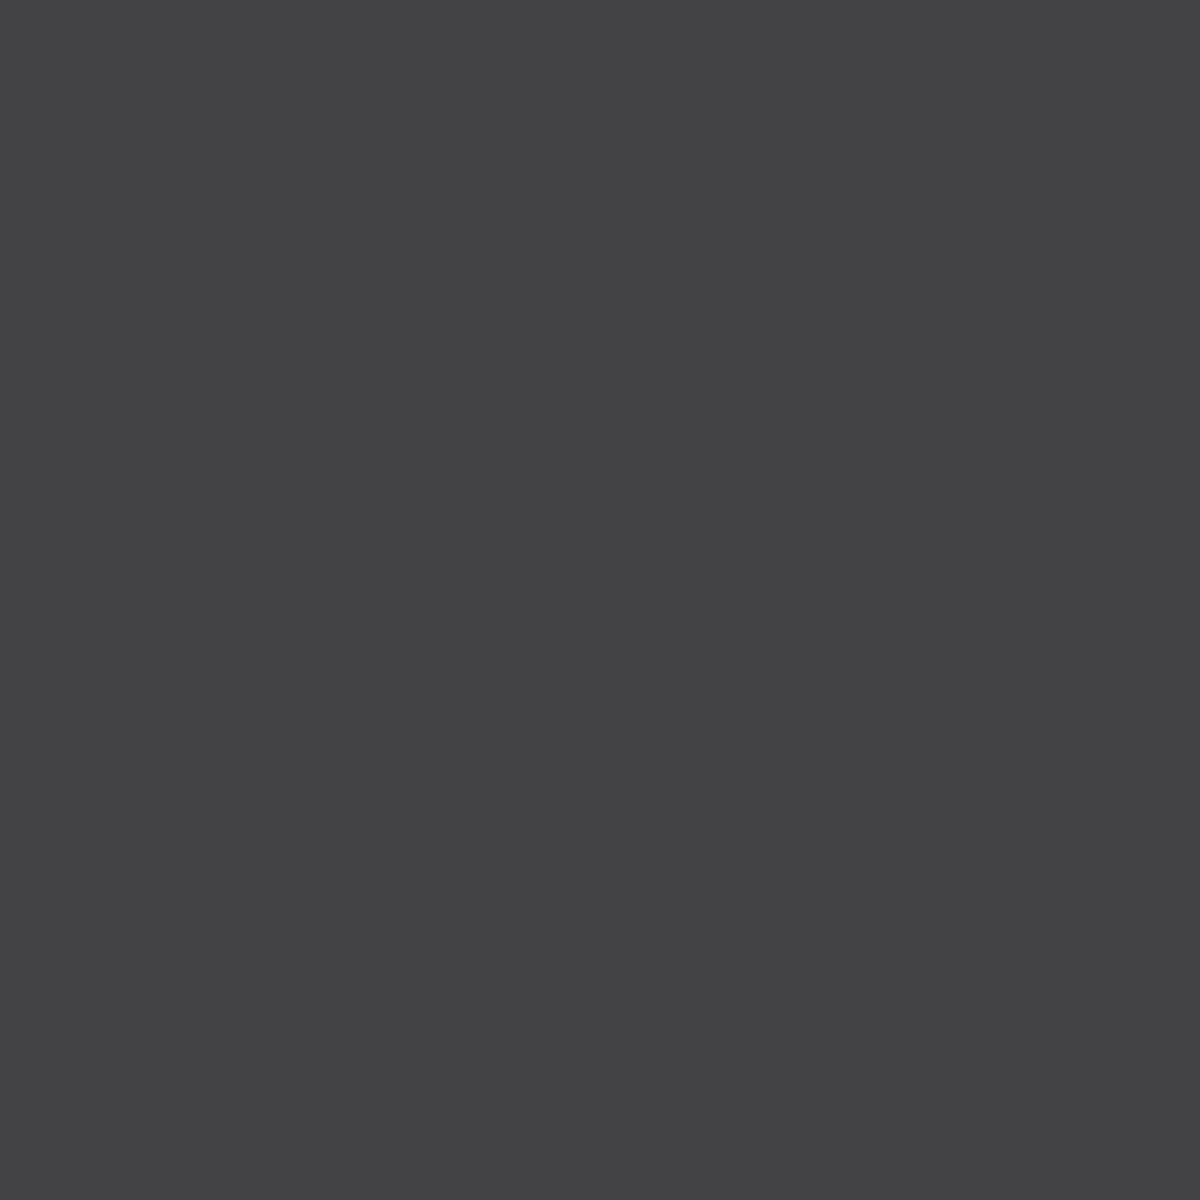 FolkArt ® Brushed Metal™ Acrylic Paint - Dark Gray, 2 oz.